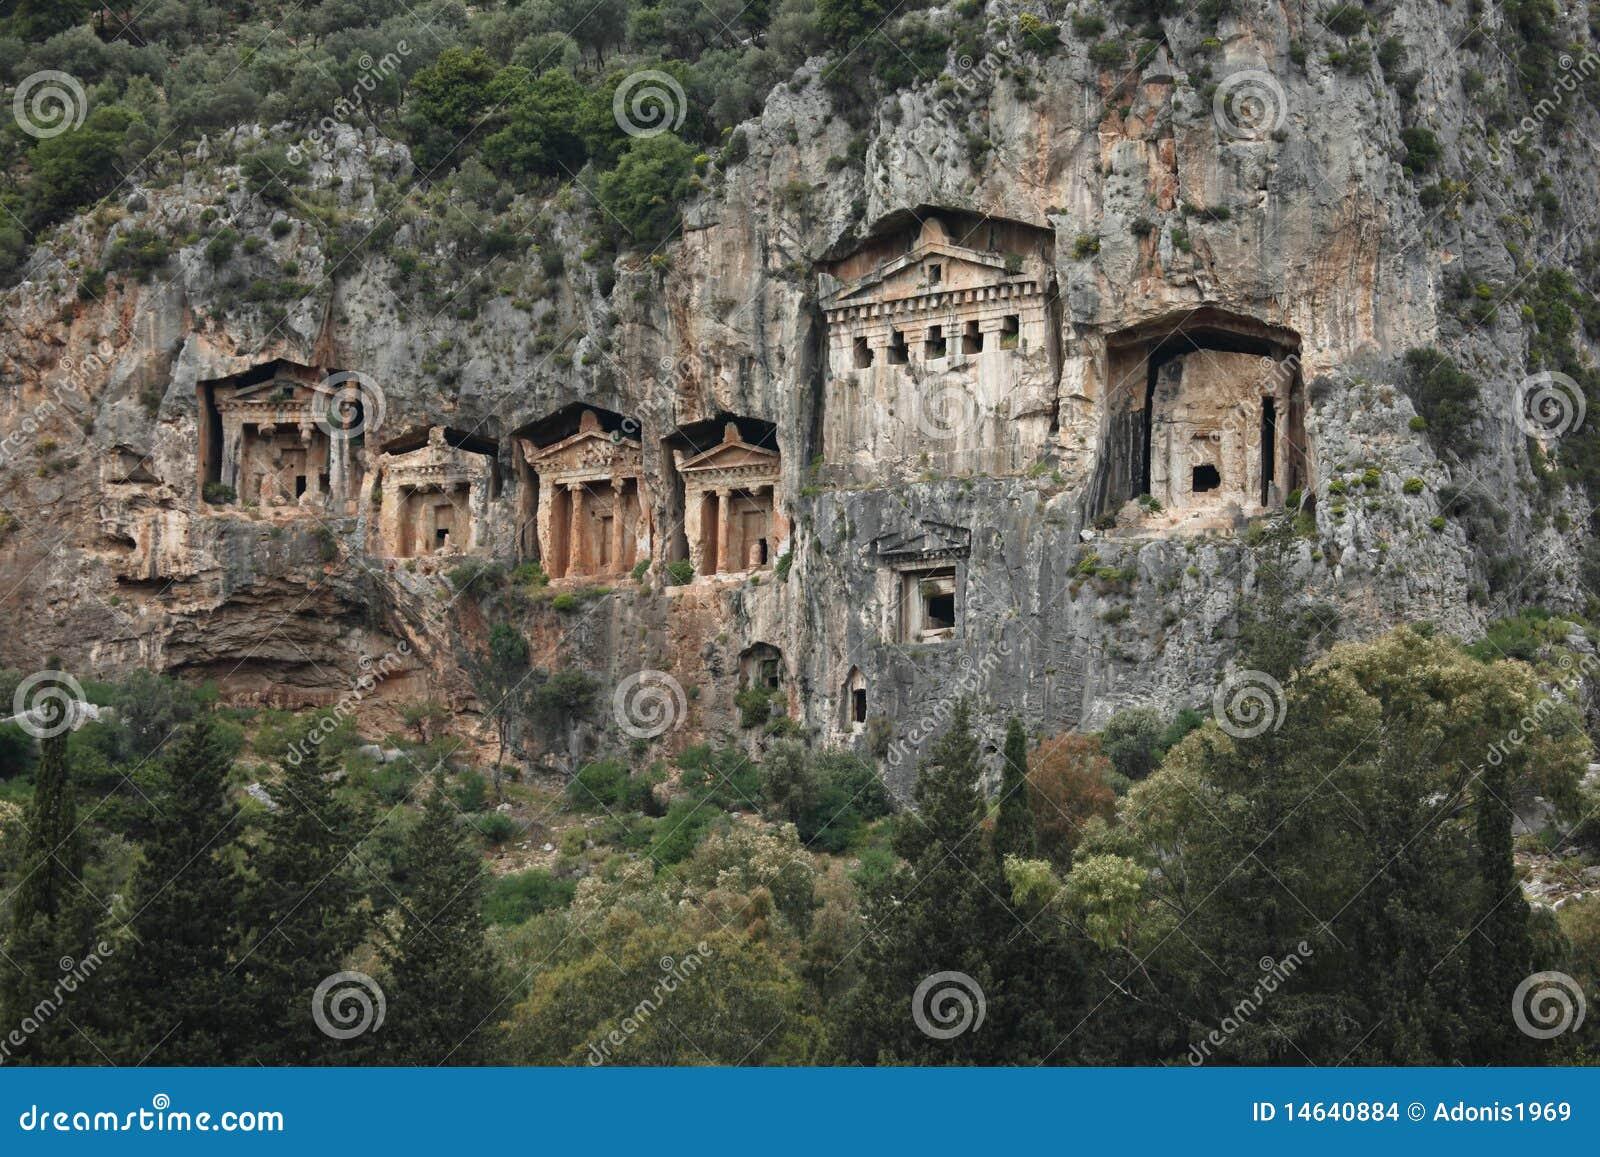 Lycian Tombs, Kaunos,Turkey Stock Images - Image: 14640884